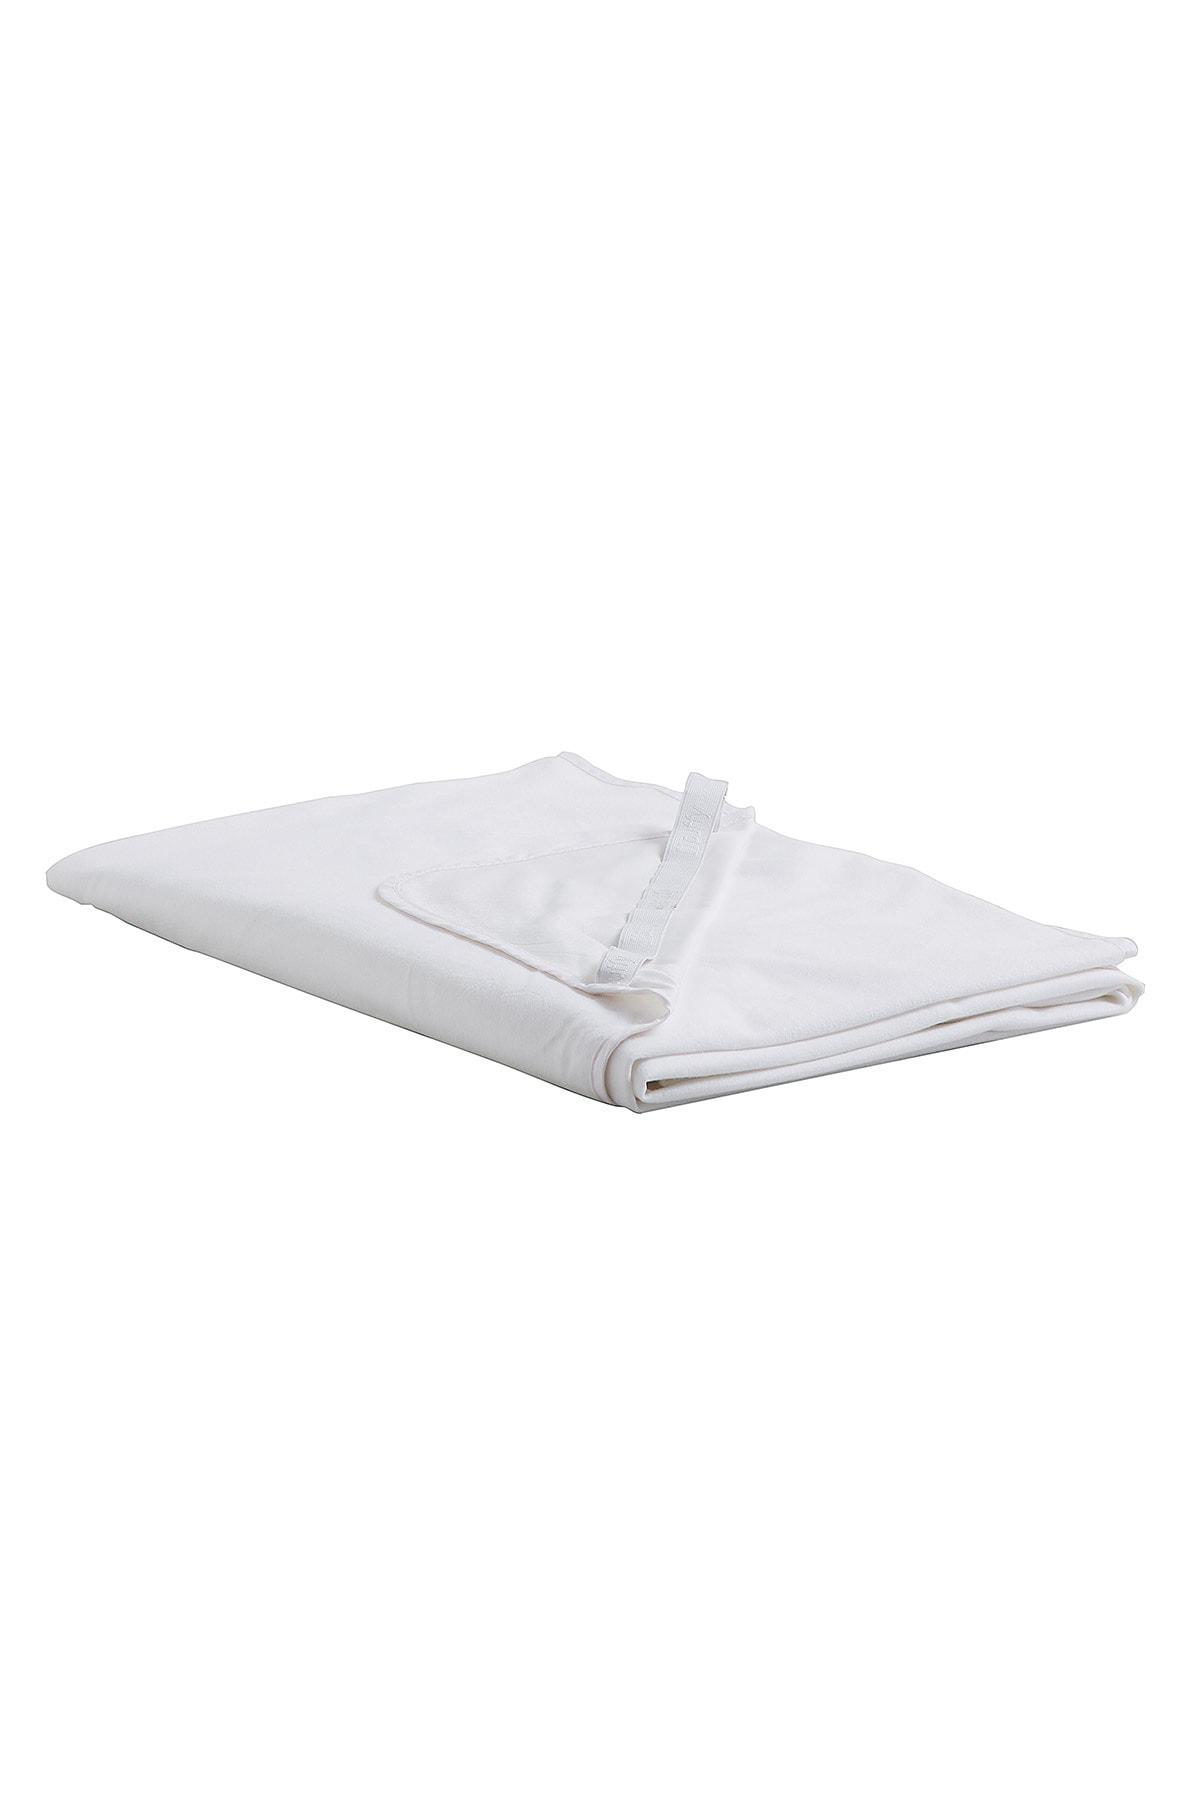 Yataş Bedding Micro Fit Lastikli Alez 2